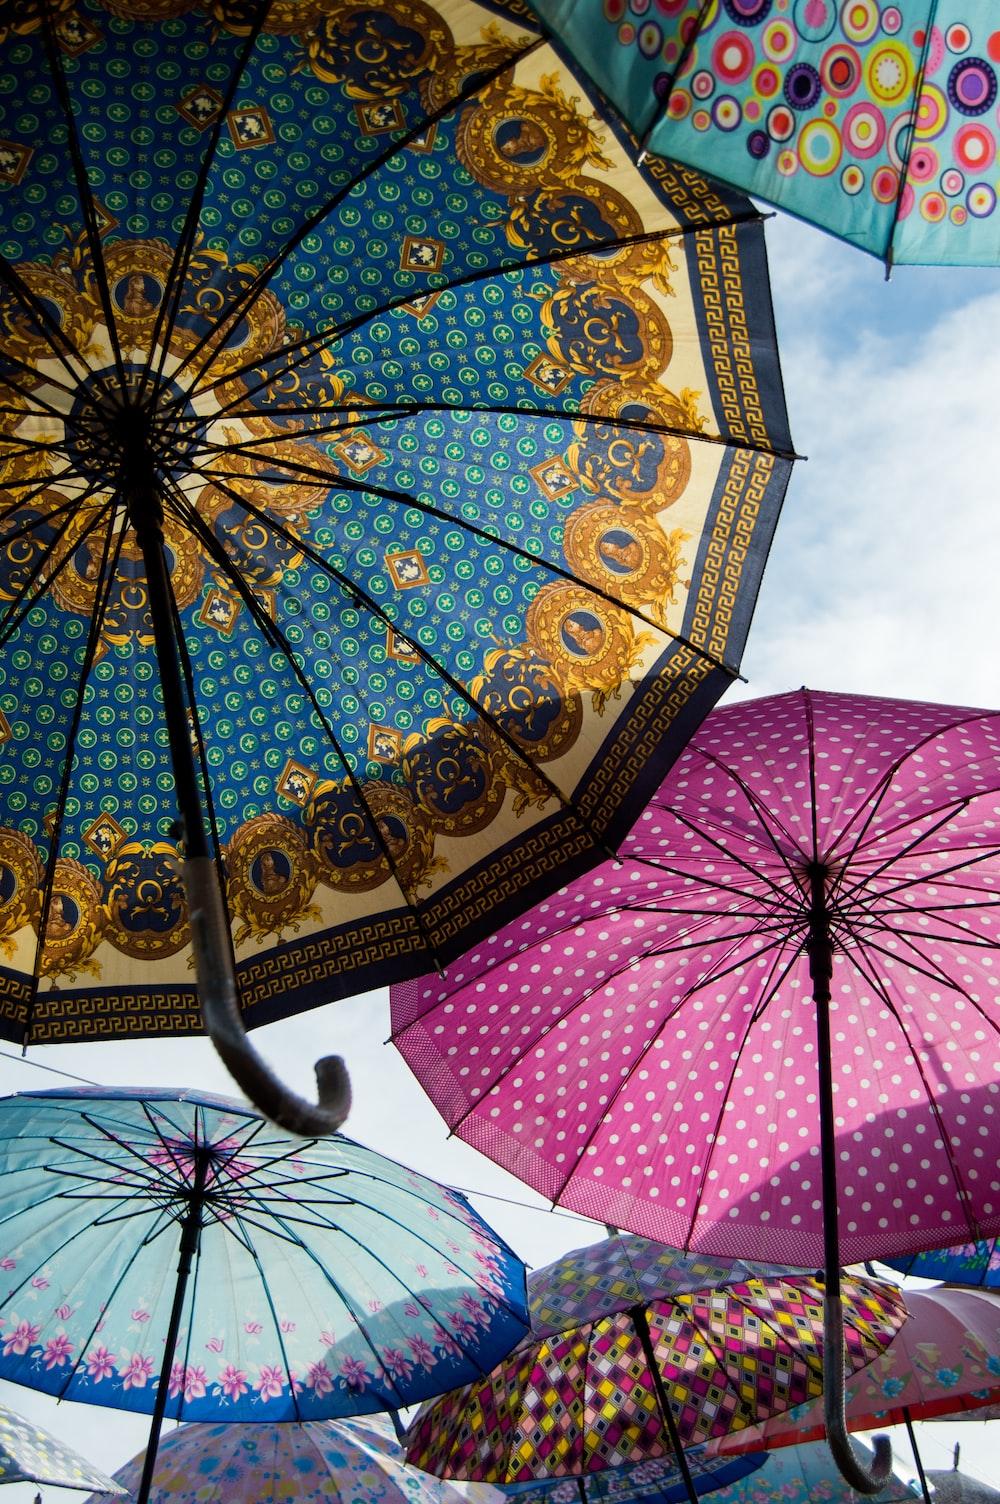 pink and blue floral umbrella